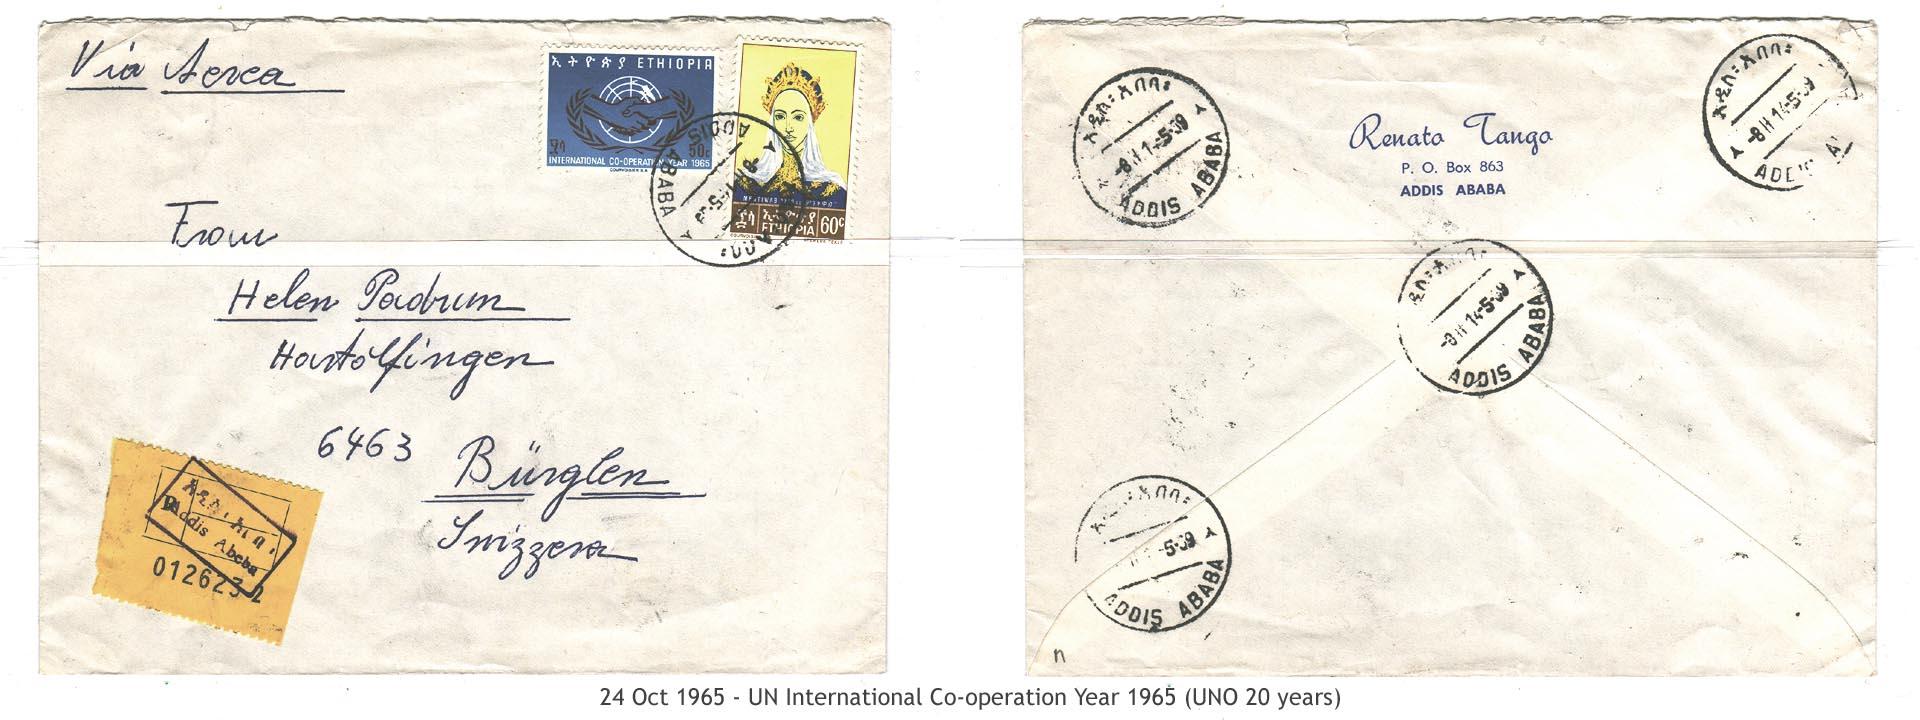 19651024 – UN International Co-operation Year 1965 (UNO 20 years)